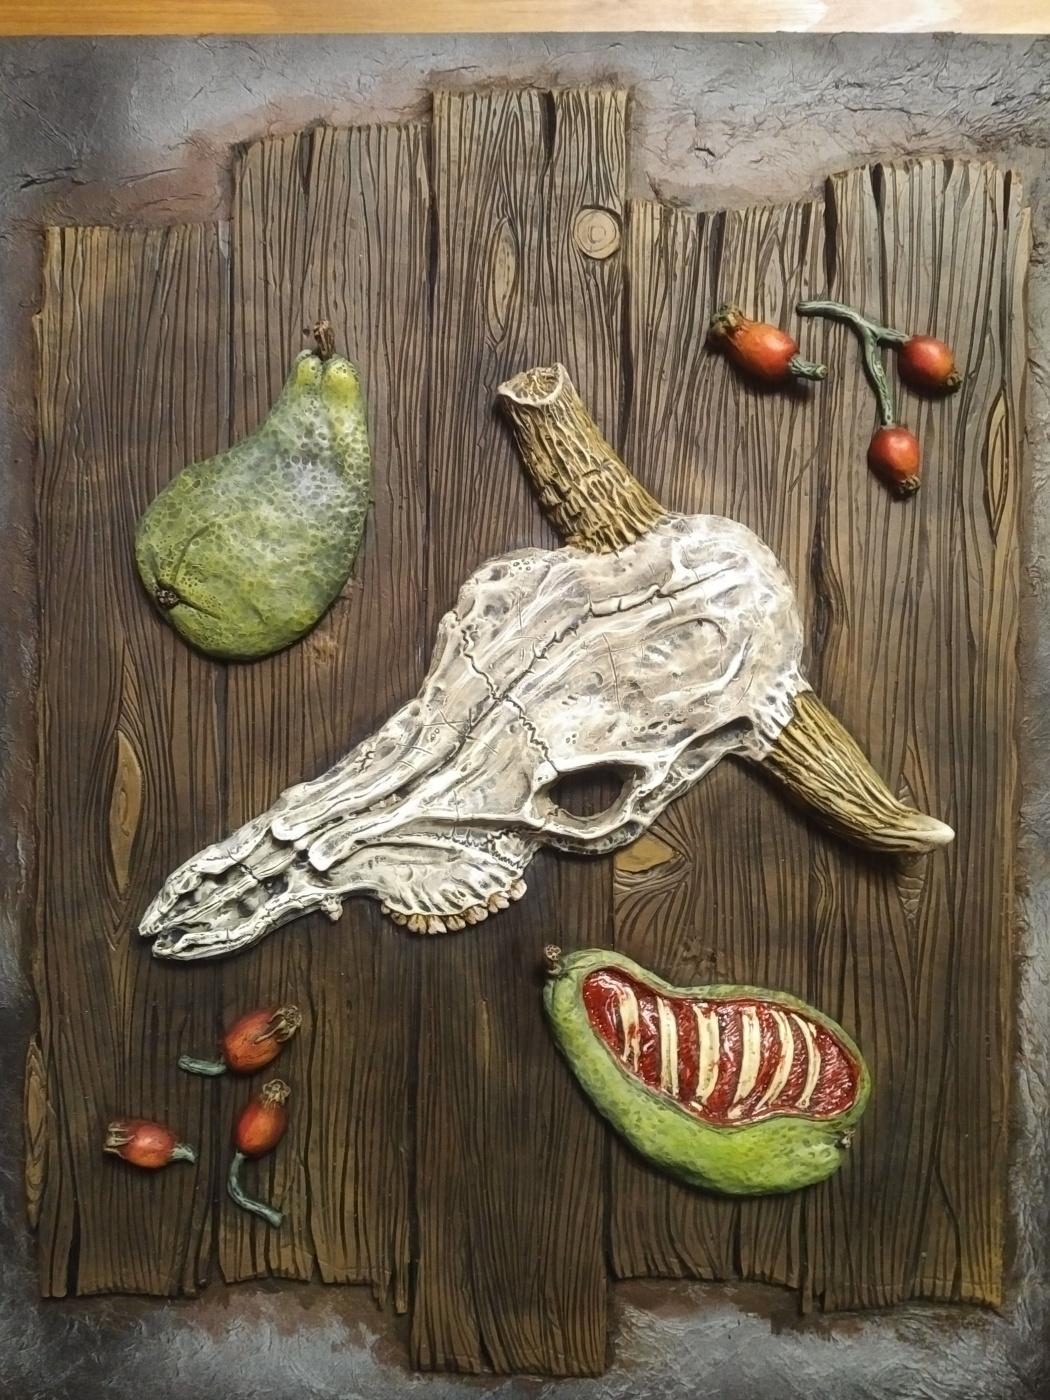 MI SHIN SIN. Still life with fleshy pears.